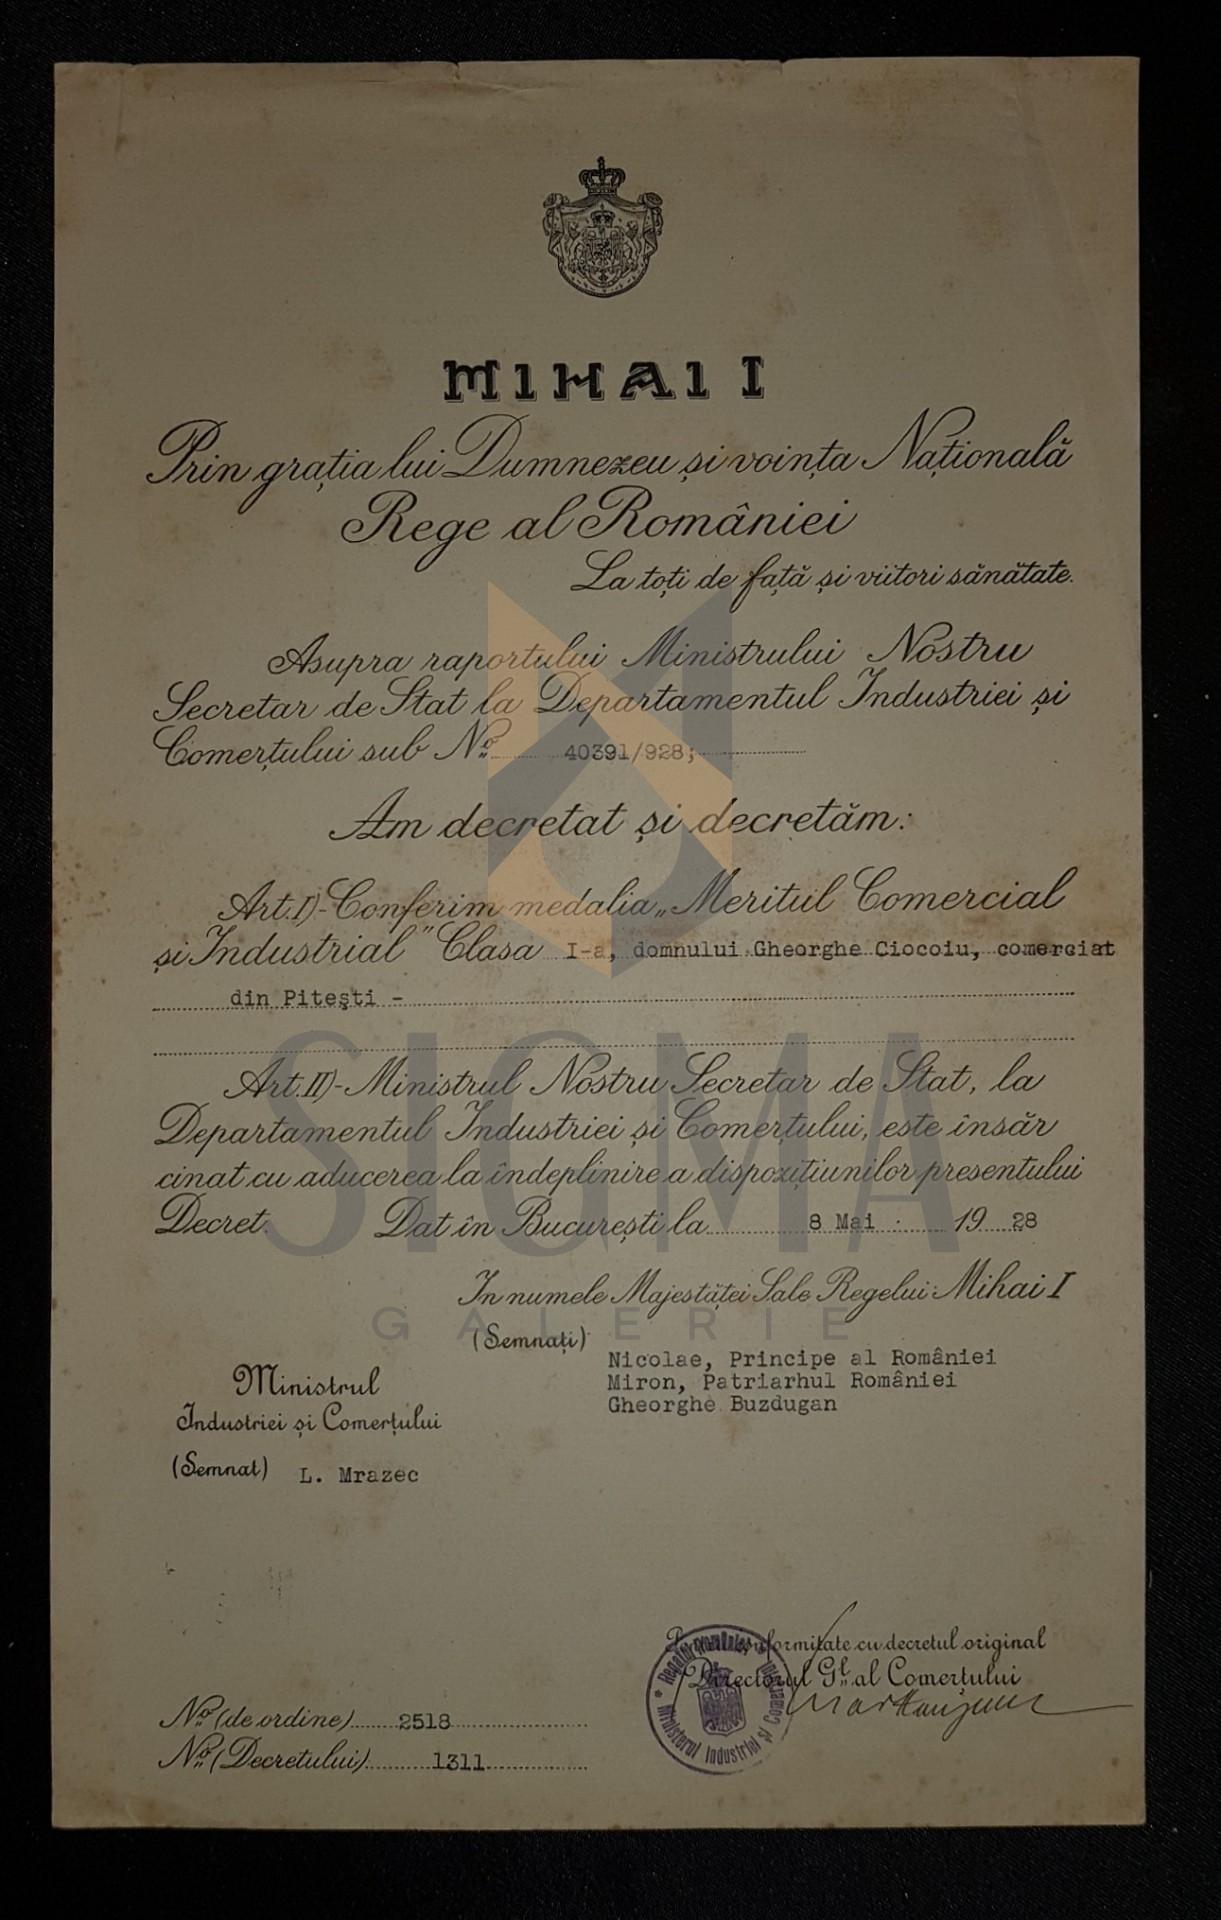 "BREVET, REGELE MIHAI I ""MERITUL COMERCIAL SI INDUSTRIAL"" CLASA I-A, FARMACIST DIN PITESTI, 1928"